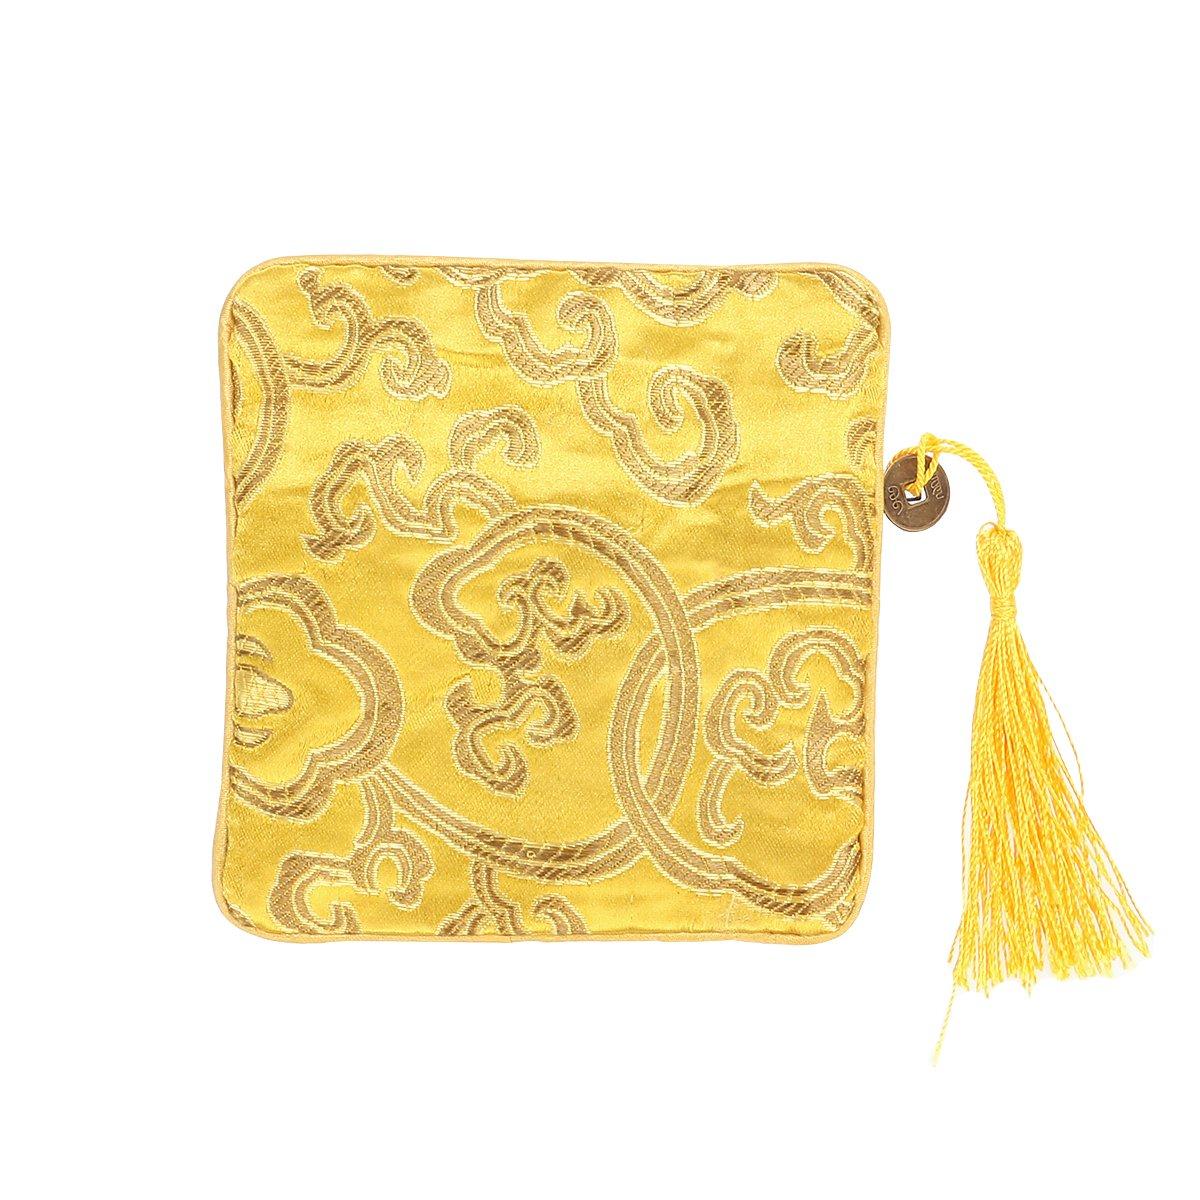 OULII Sac en trousse chinoise en soie Sac à monnaie Brocade brodé Tassel Zipper Wallet (Bright Yellow) Z181815GSVC35476